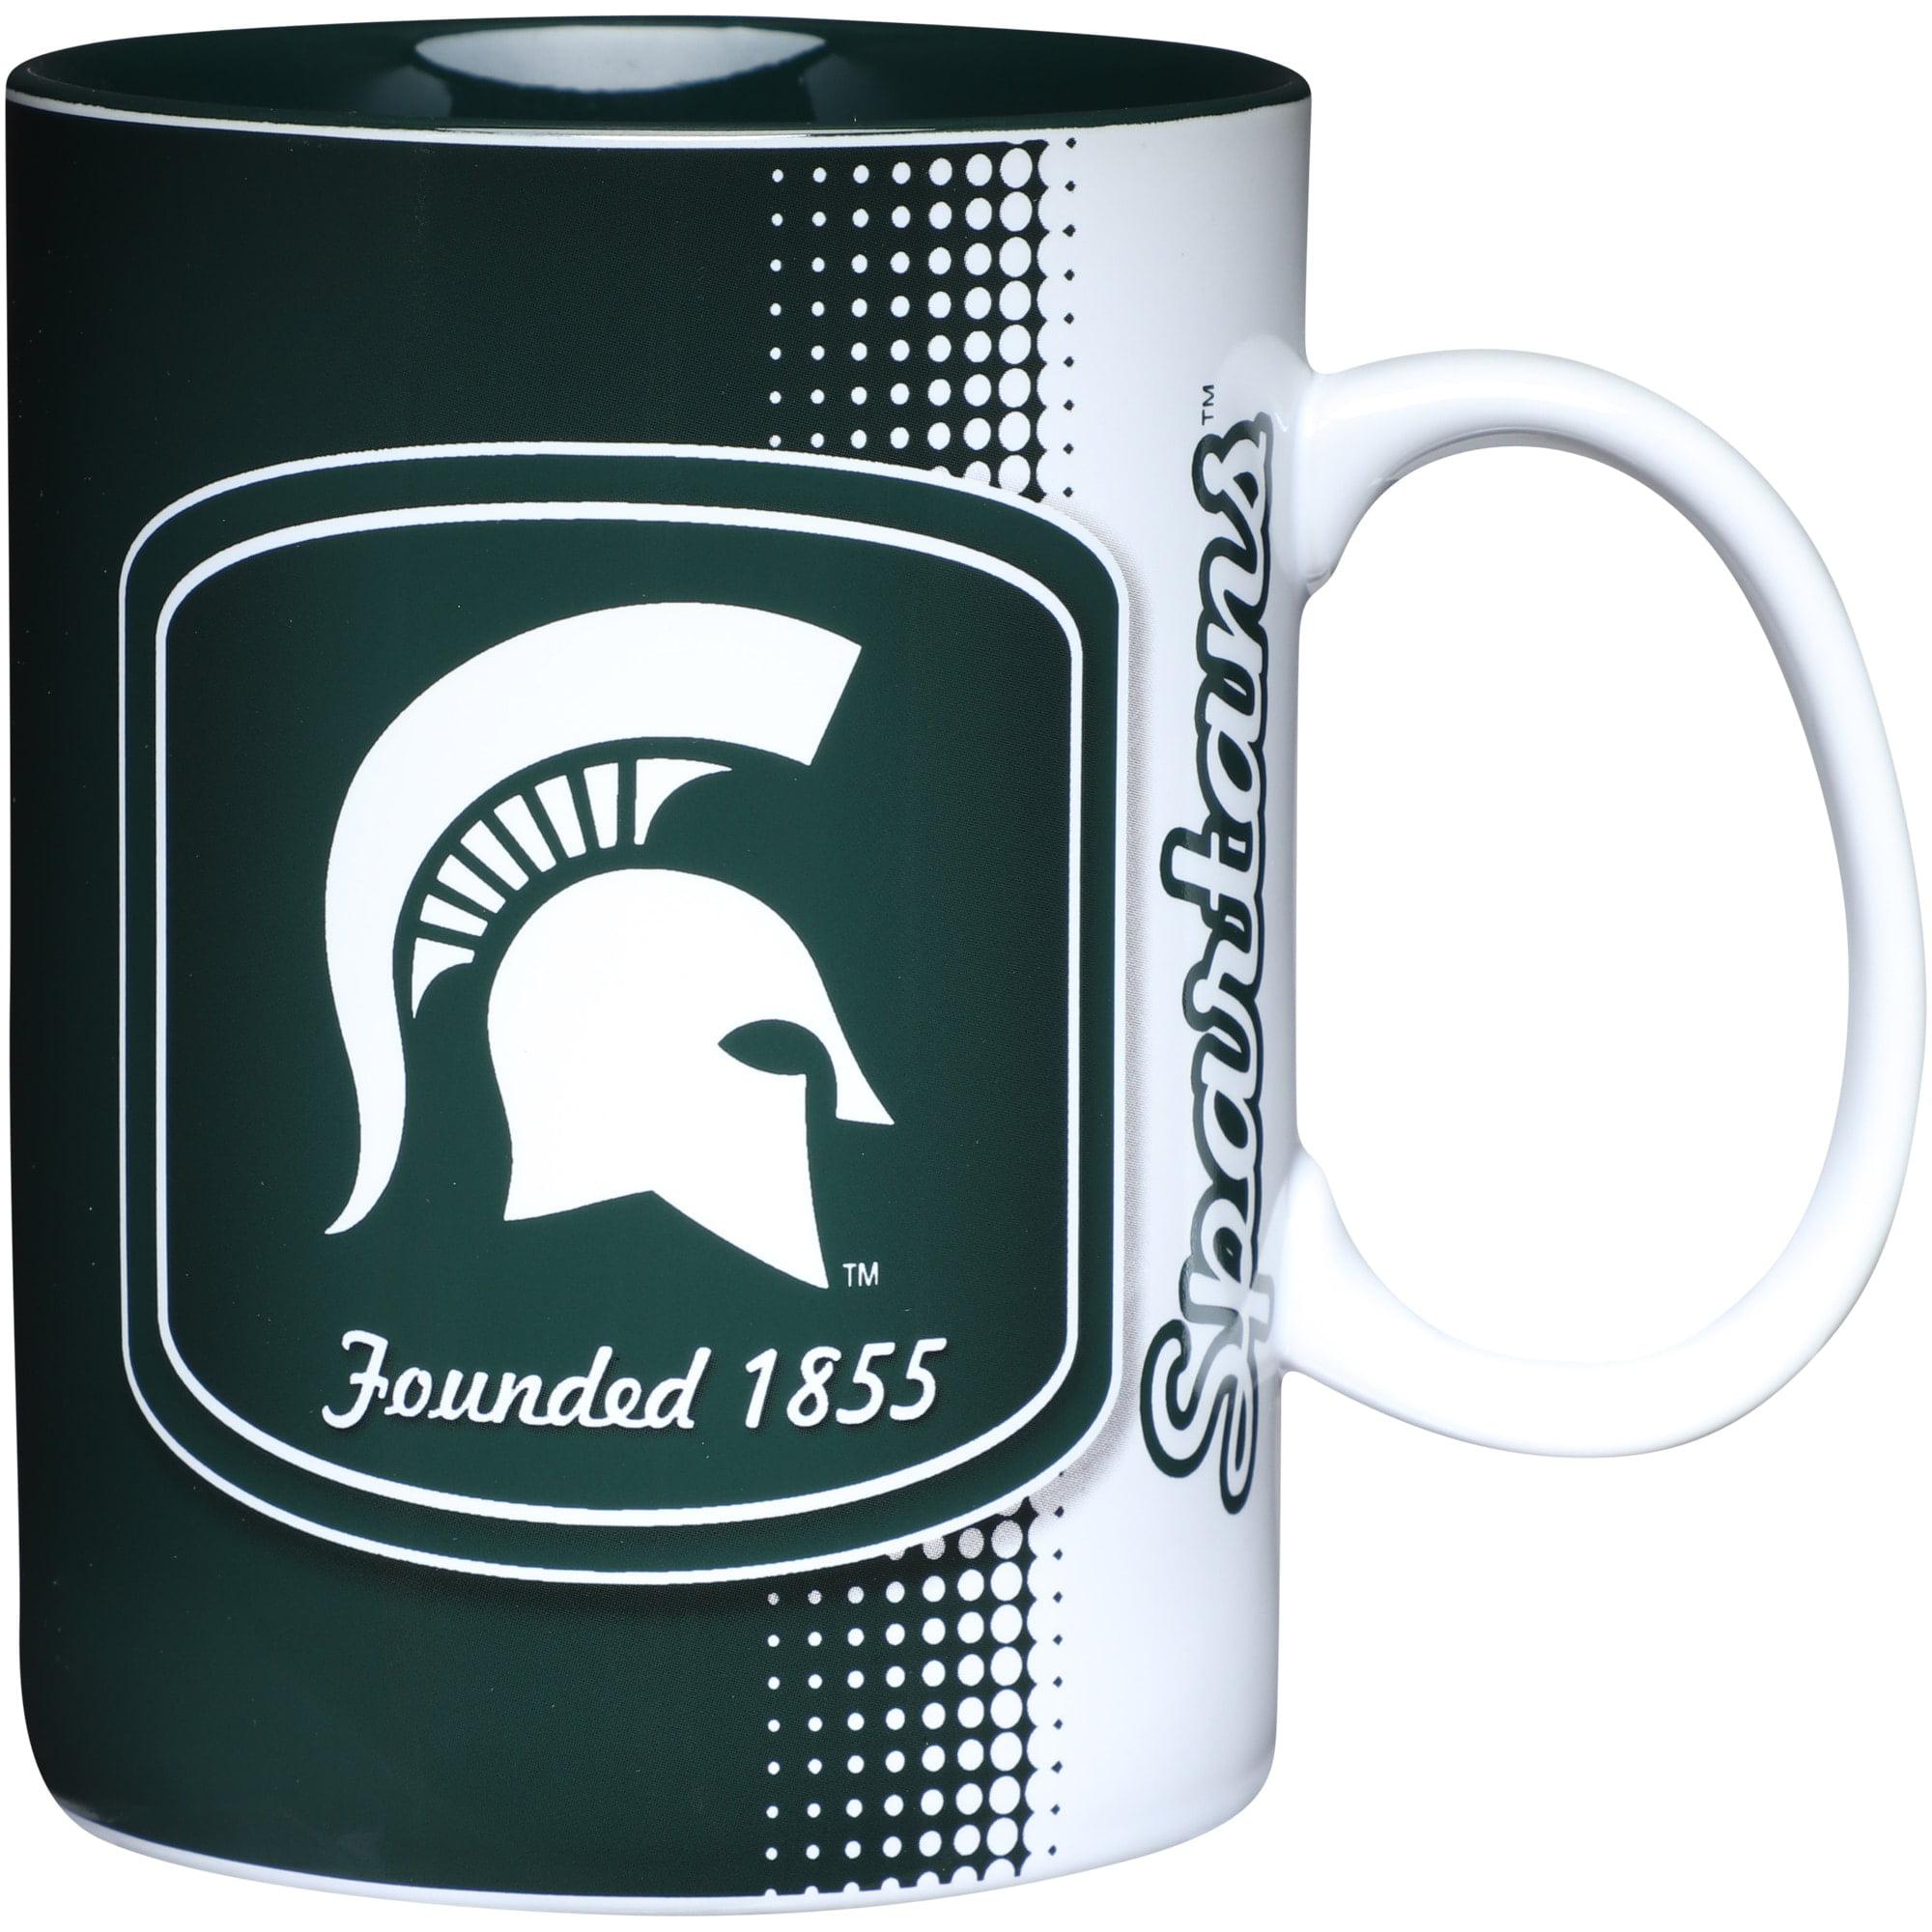 19 NCAA Tennessee Volunteers 15 oz Ceramic Coffee Mug with Metallic Graphics